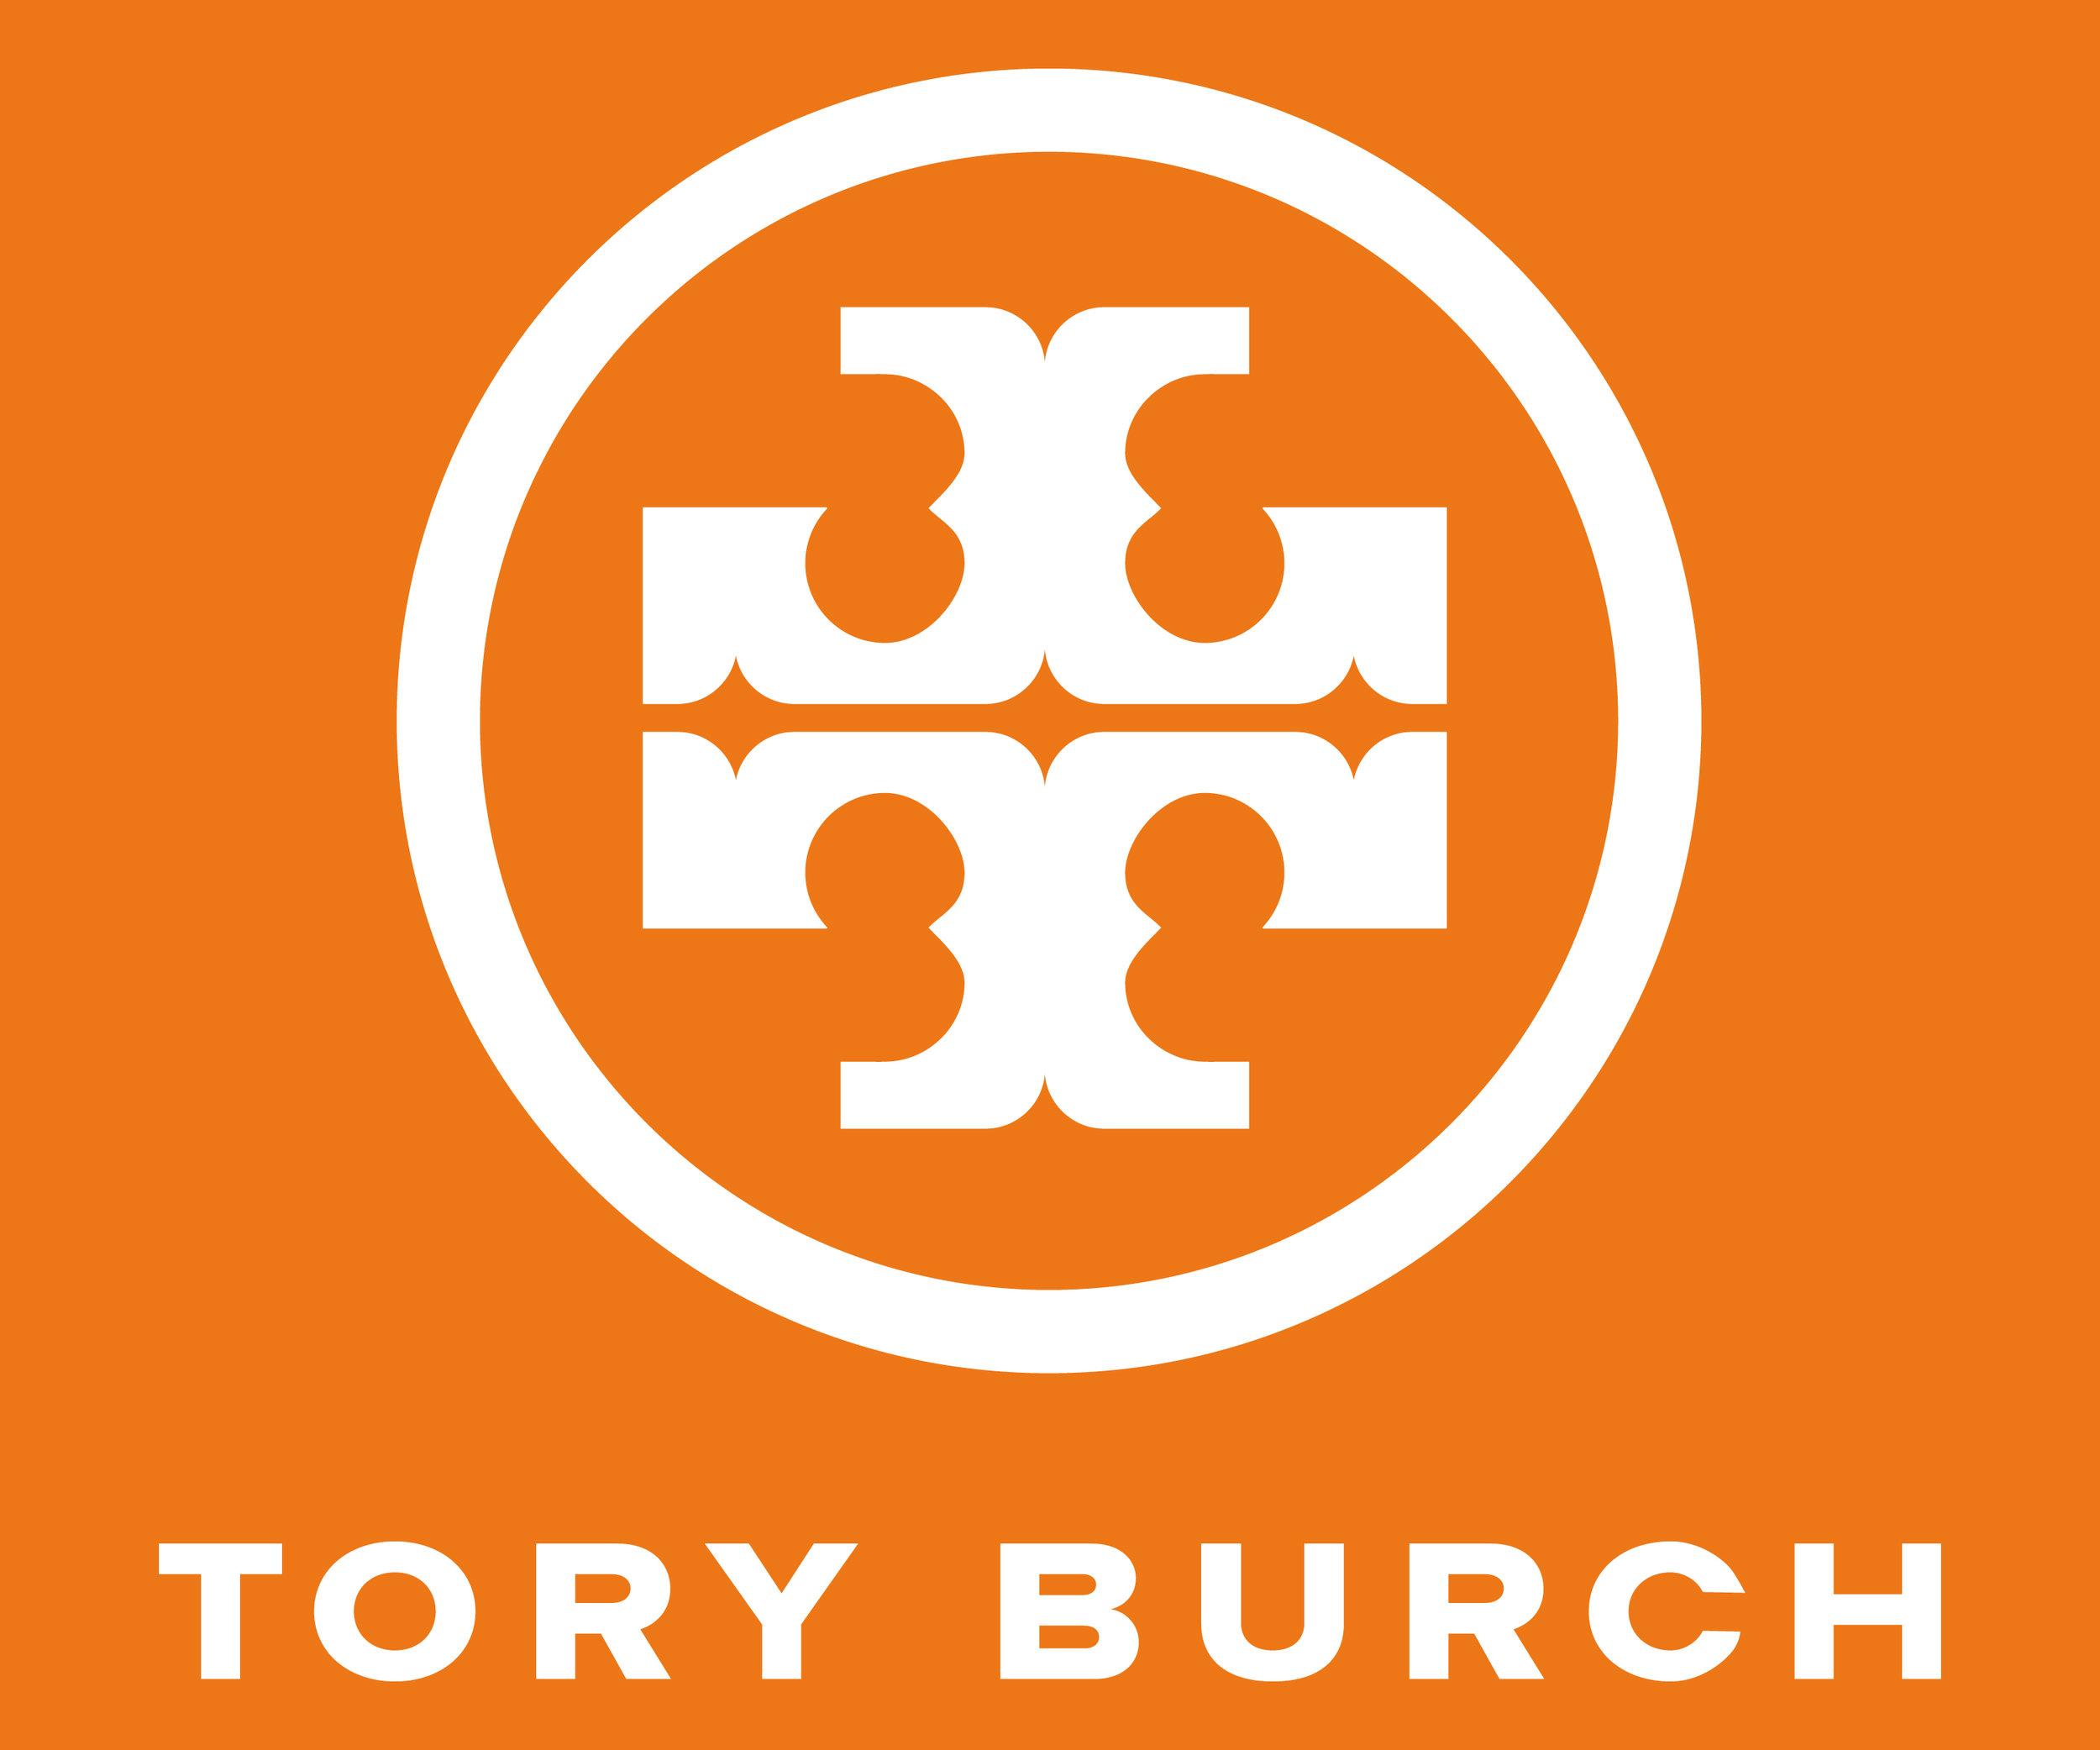 Tory-BurchLogo1.jpg